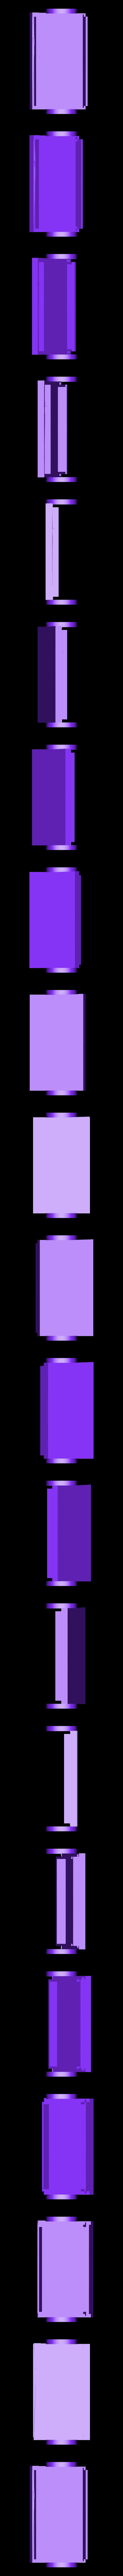 03_couvercle_boite_lumiere.stl Download free STL file Photo copier slides negative super 8 • Template to 3D print, titi01